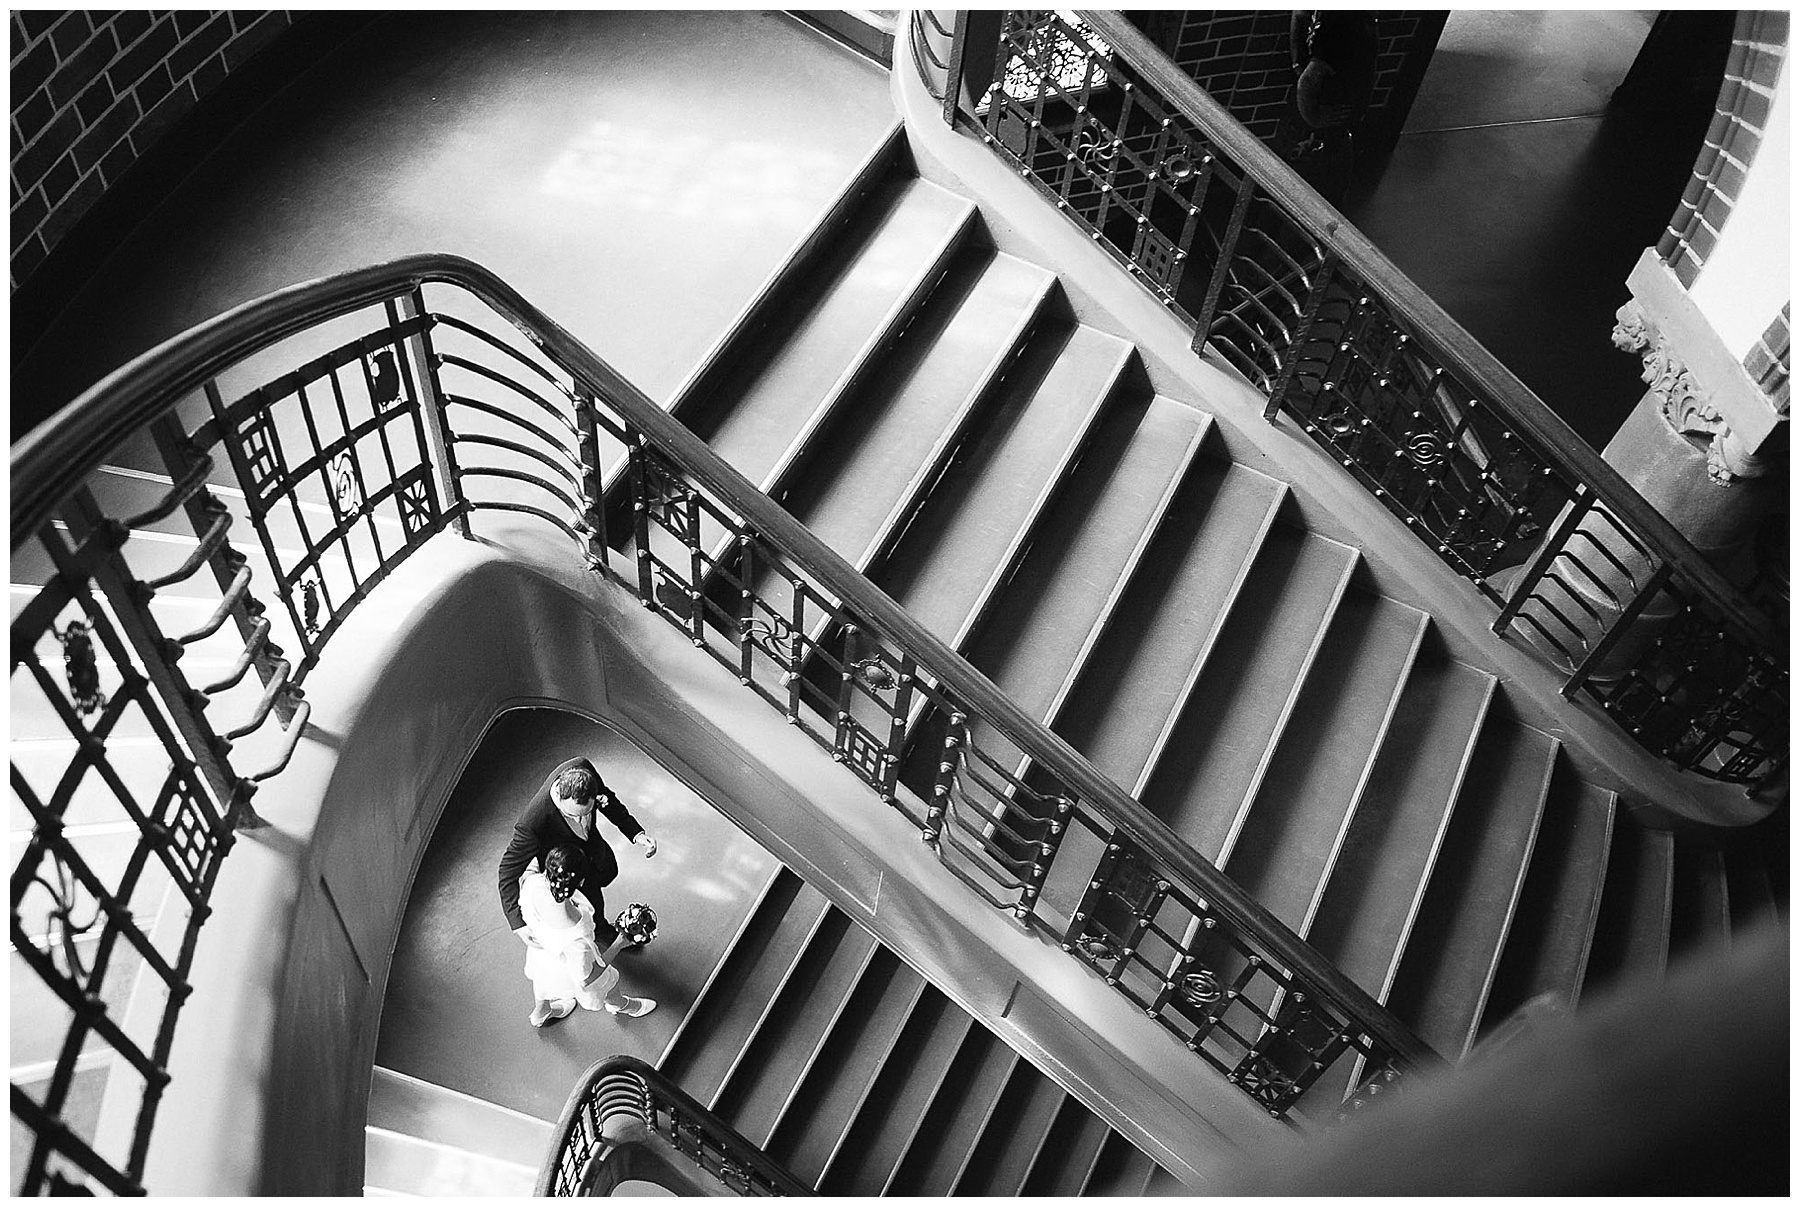 Hochzeitsfotograf Boris Mehl aus Berlin